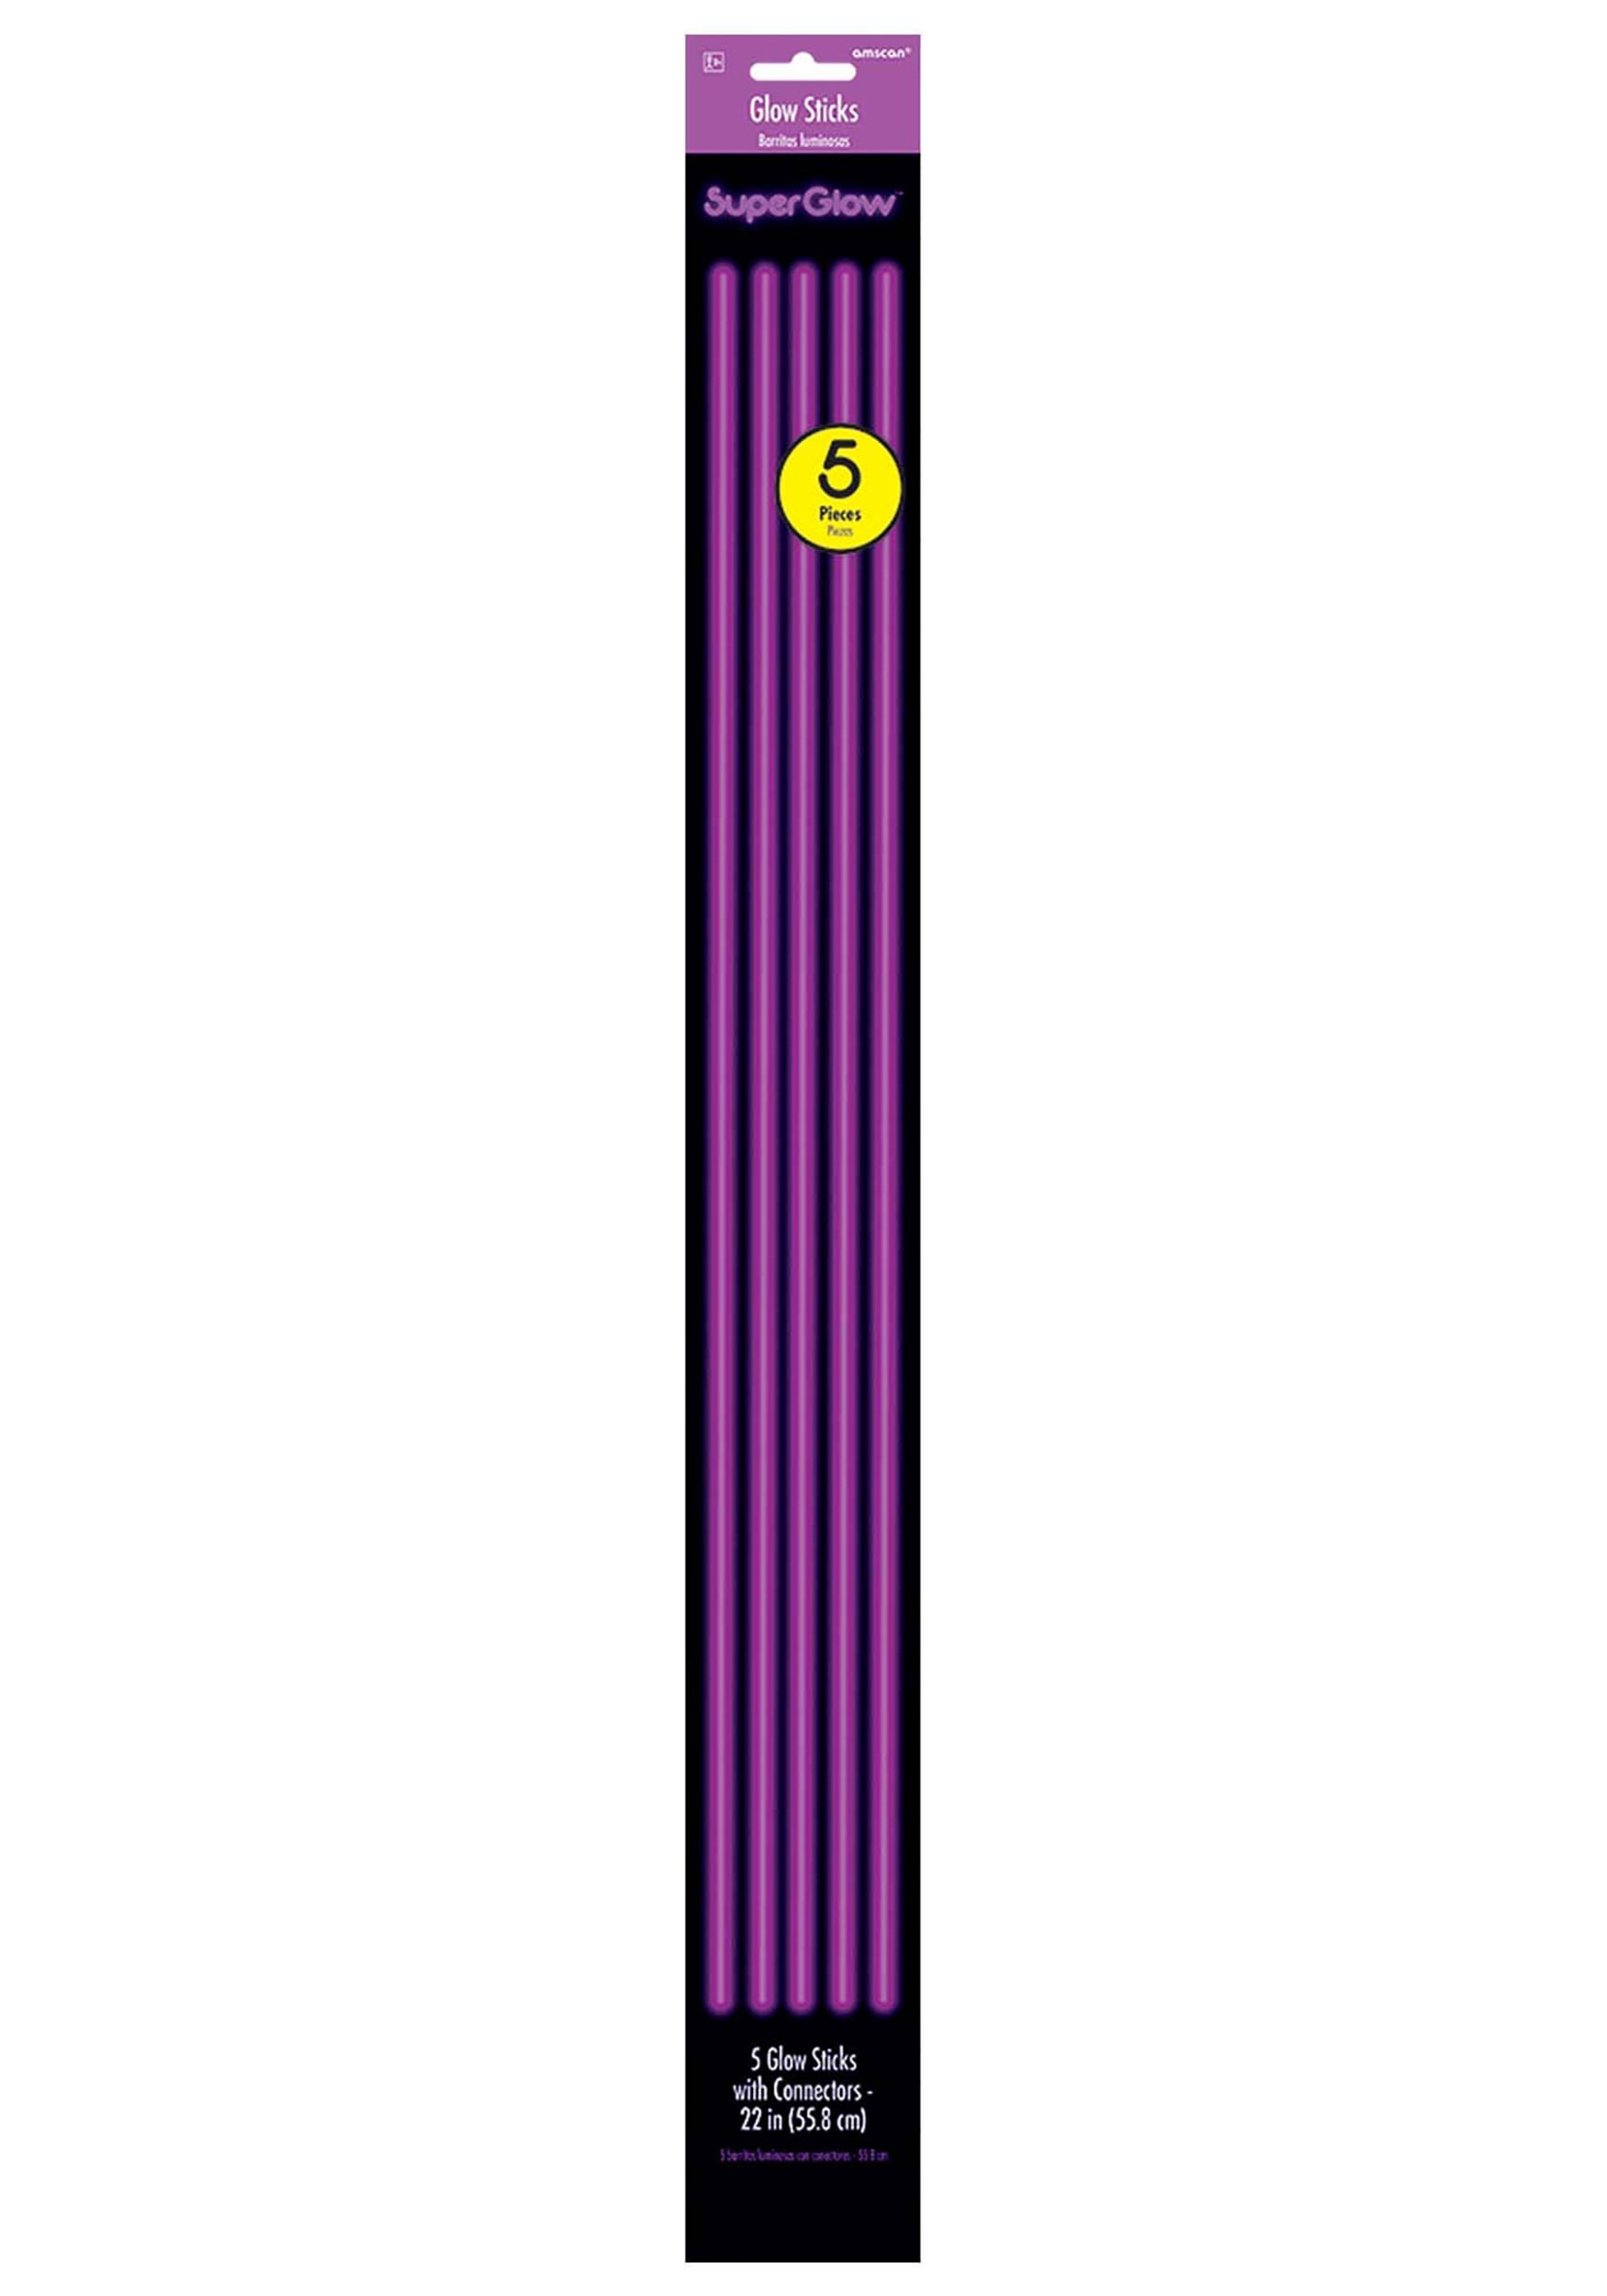 22 purple glowsticks pack of 5